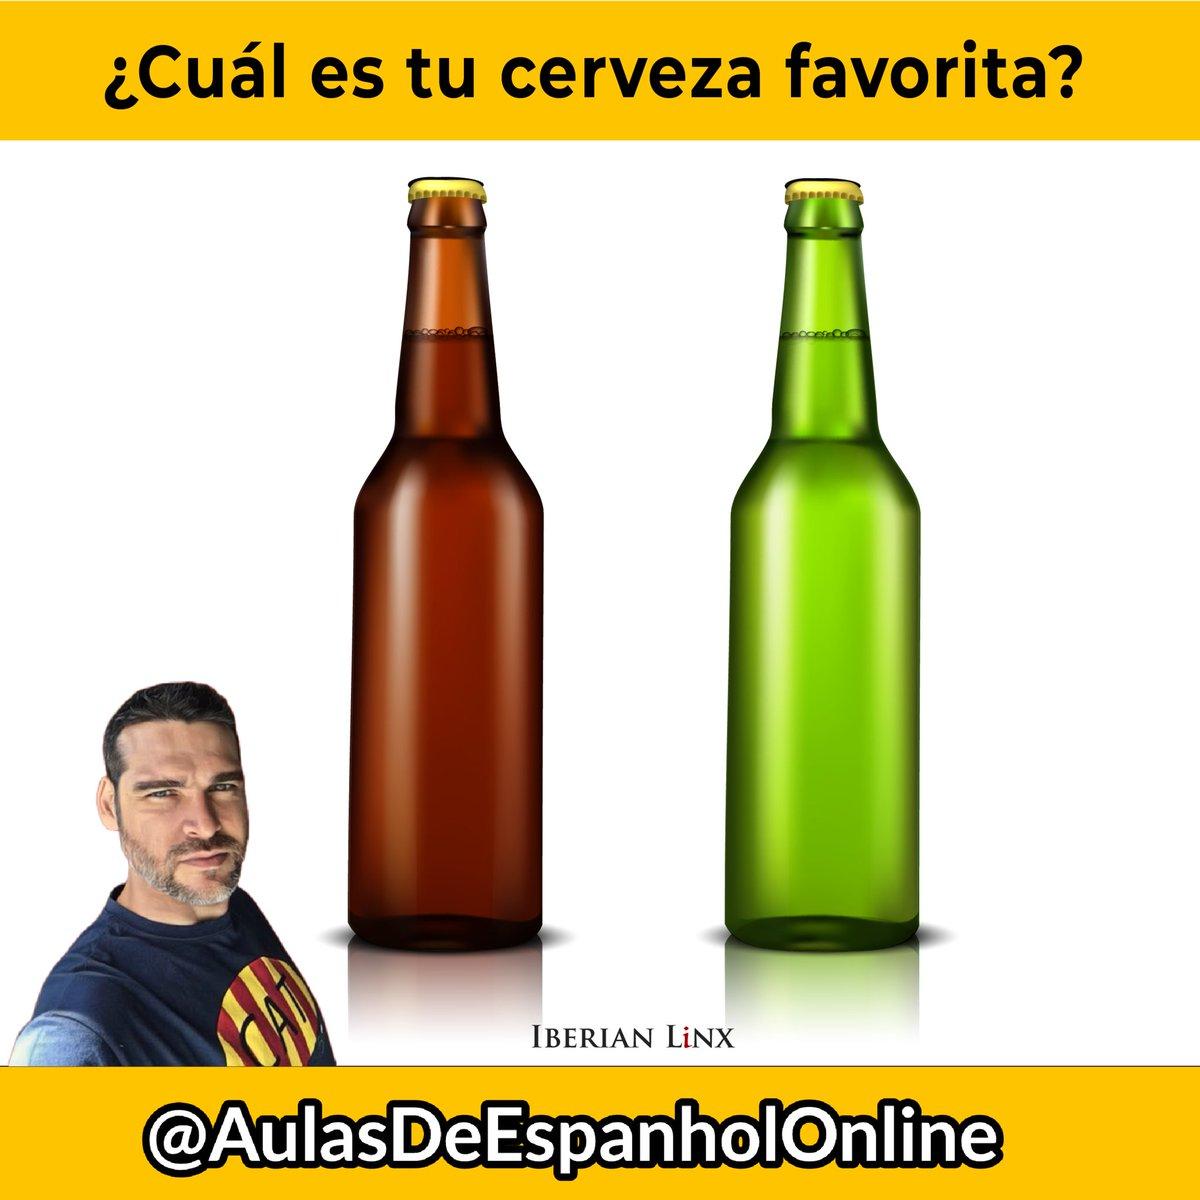 ¿Cuál es tu cerveza favorita?  #espanhol #aprendendoespanhol #estrelladamm #español #barcelona #espanholparaportugueses #spanishwordoftheday #xibeca #entrepreneurship #スペイン語 #bcn #seo #cerveza #cerveja #beer #ビア #birra https://t.co/0260uFn0Mo